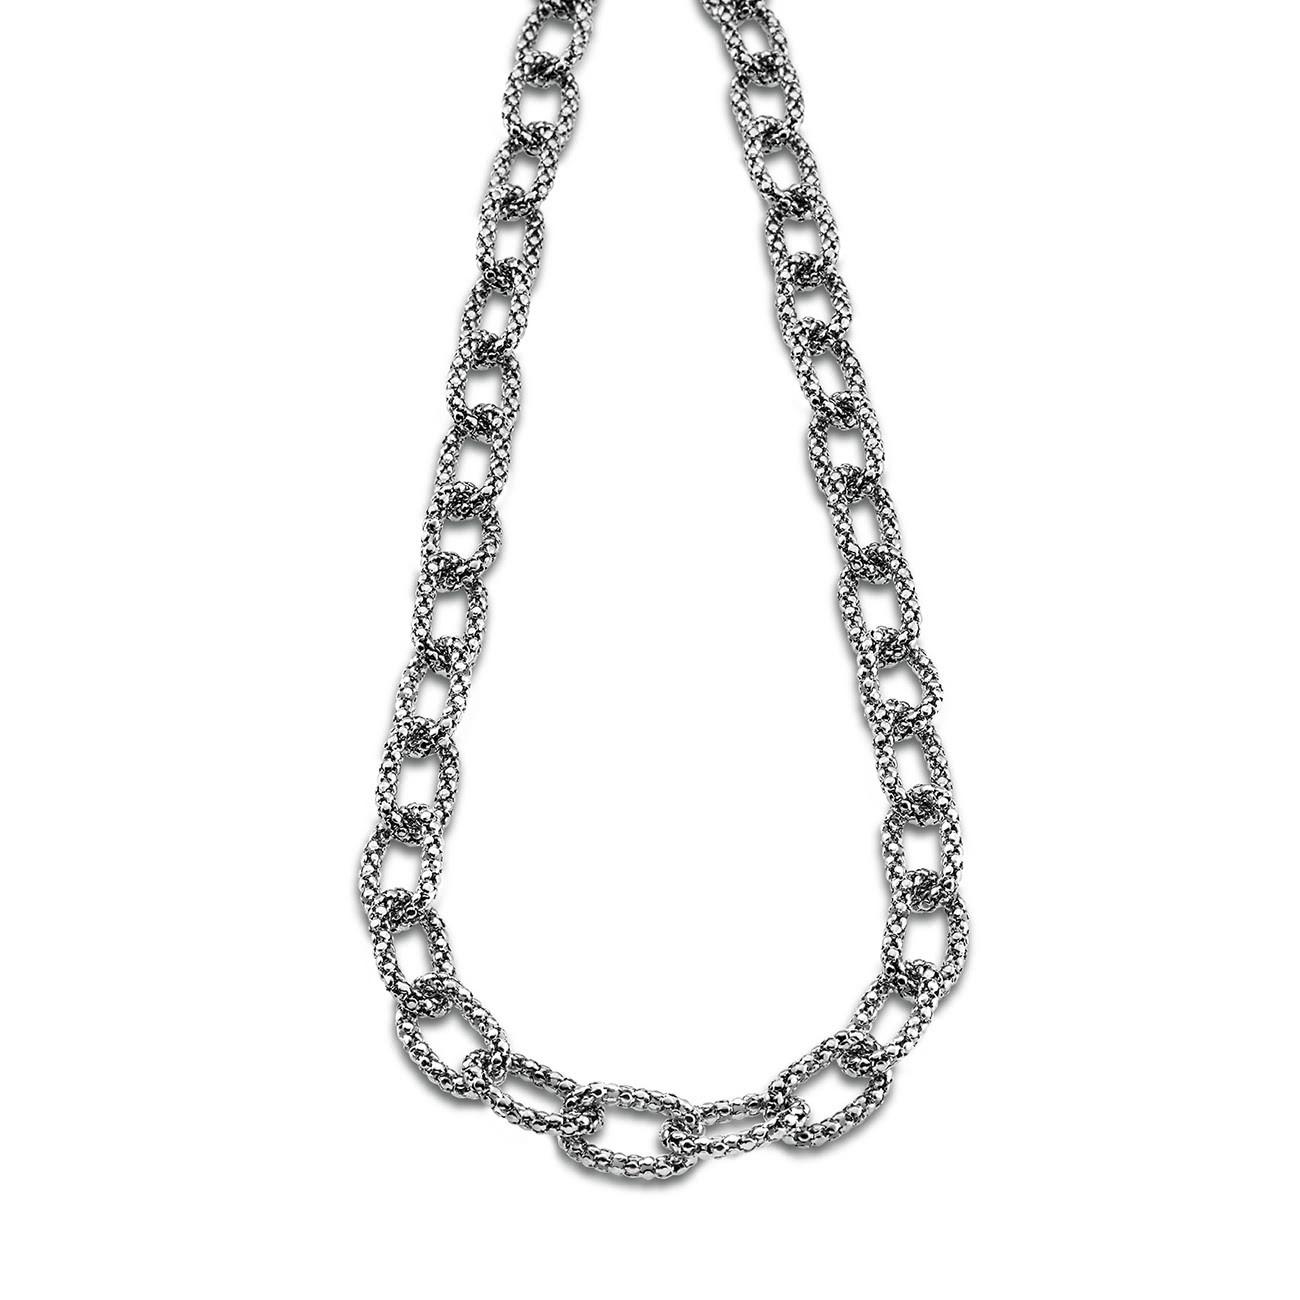 LOTUS Style Halskette Damen LS1825-1/1 Trend Edelstahl silber JLS1825-1-1